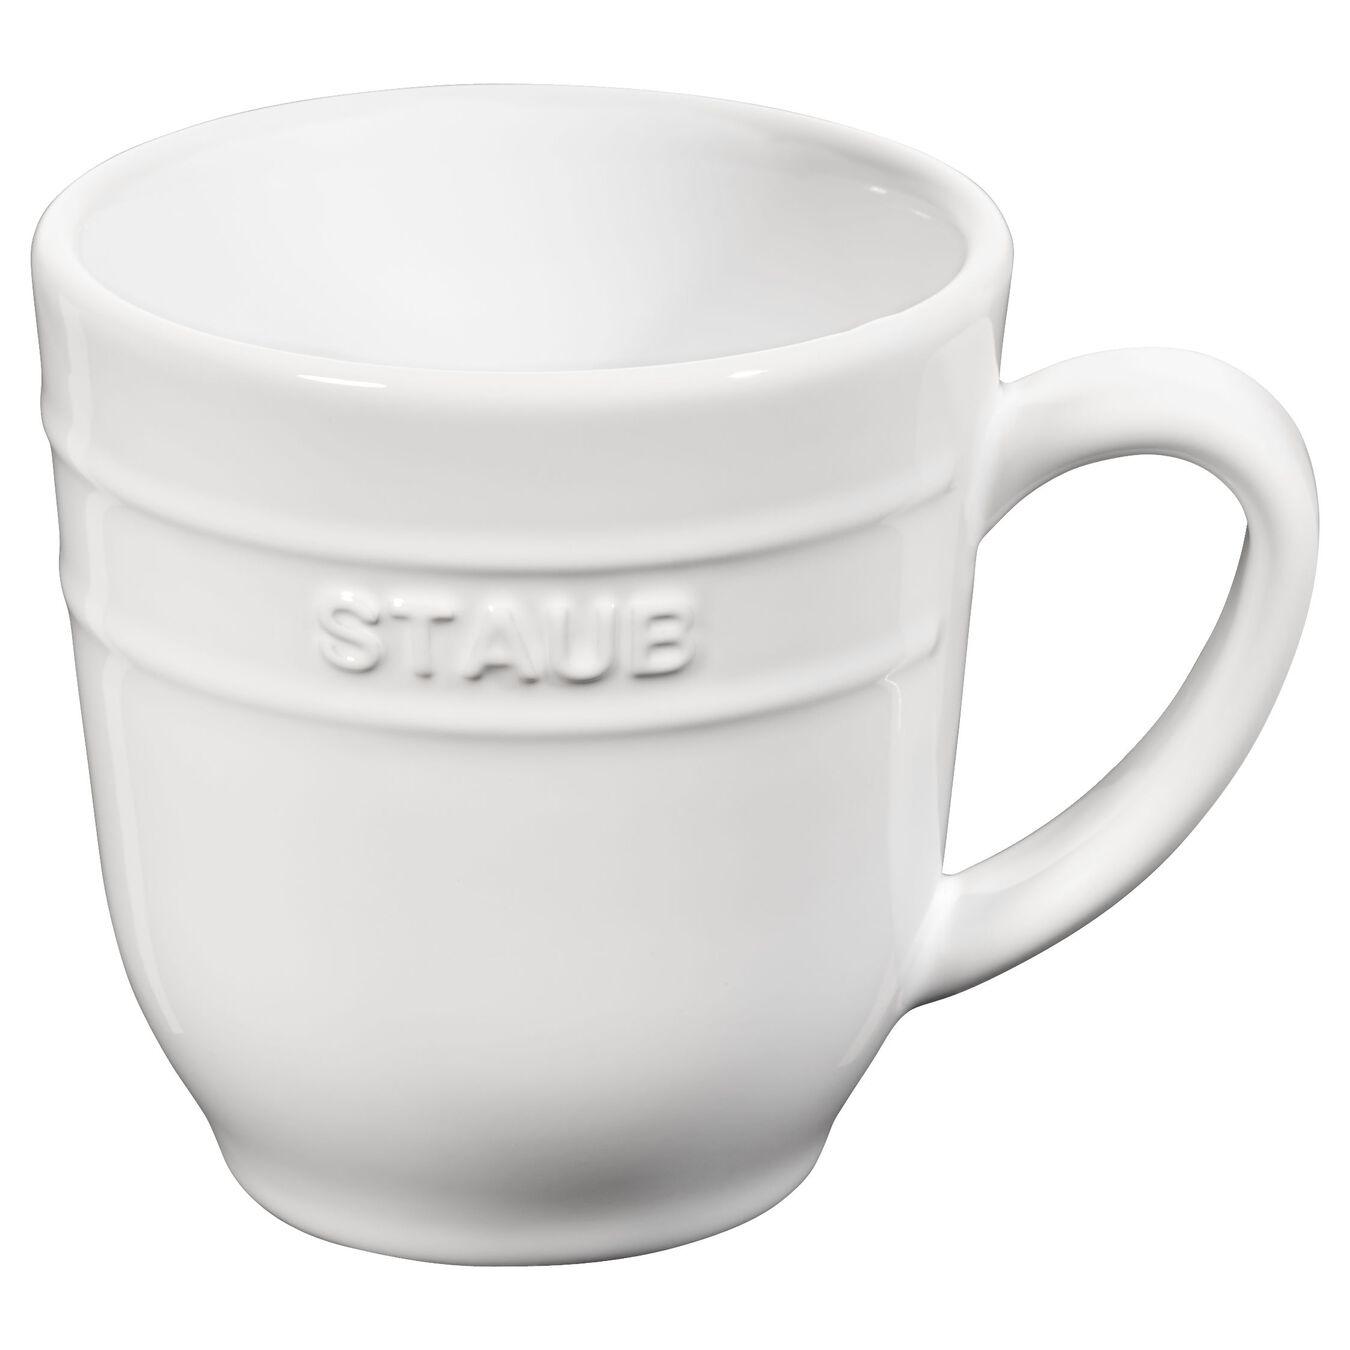 Mug 350 ml, Blanc pur, Céramique,,large 1